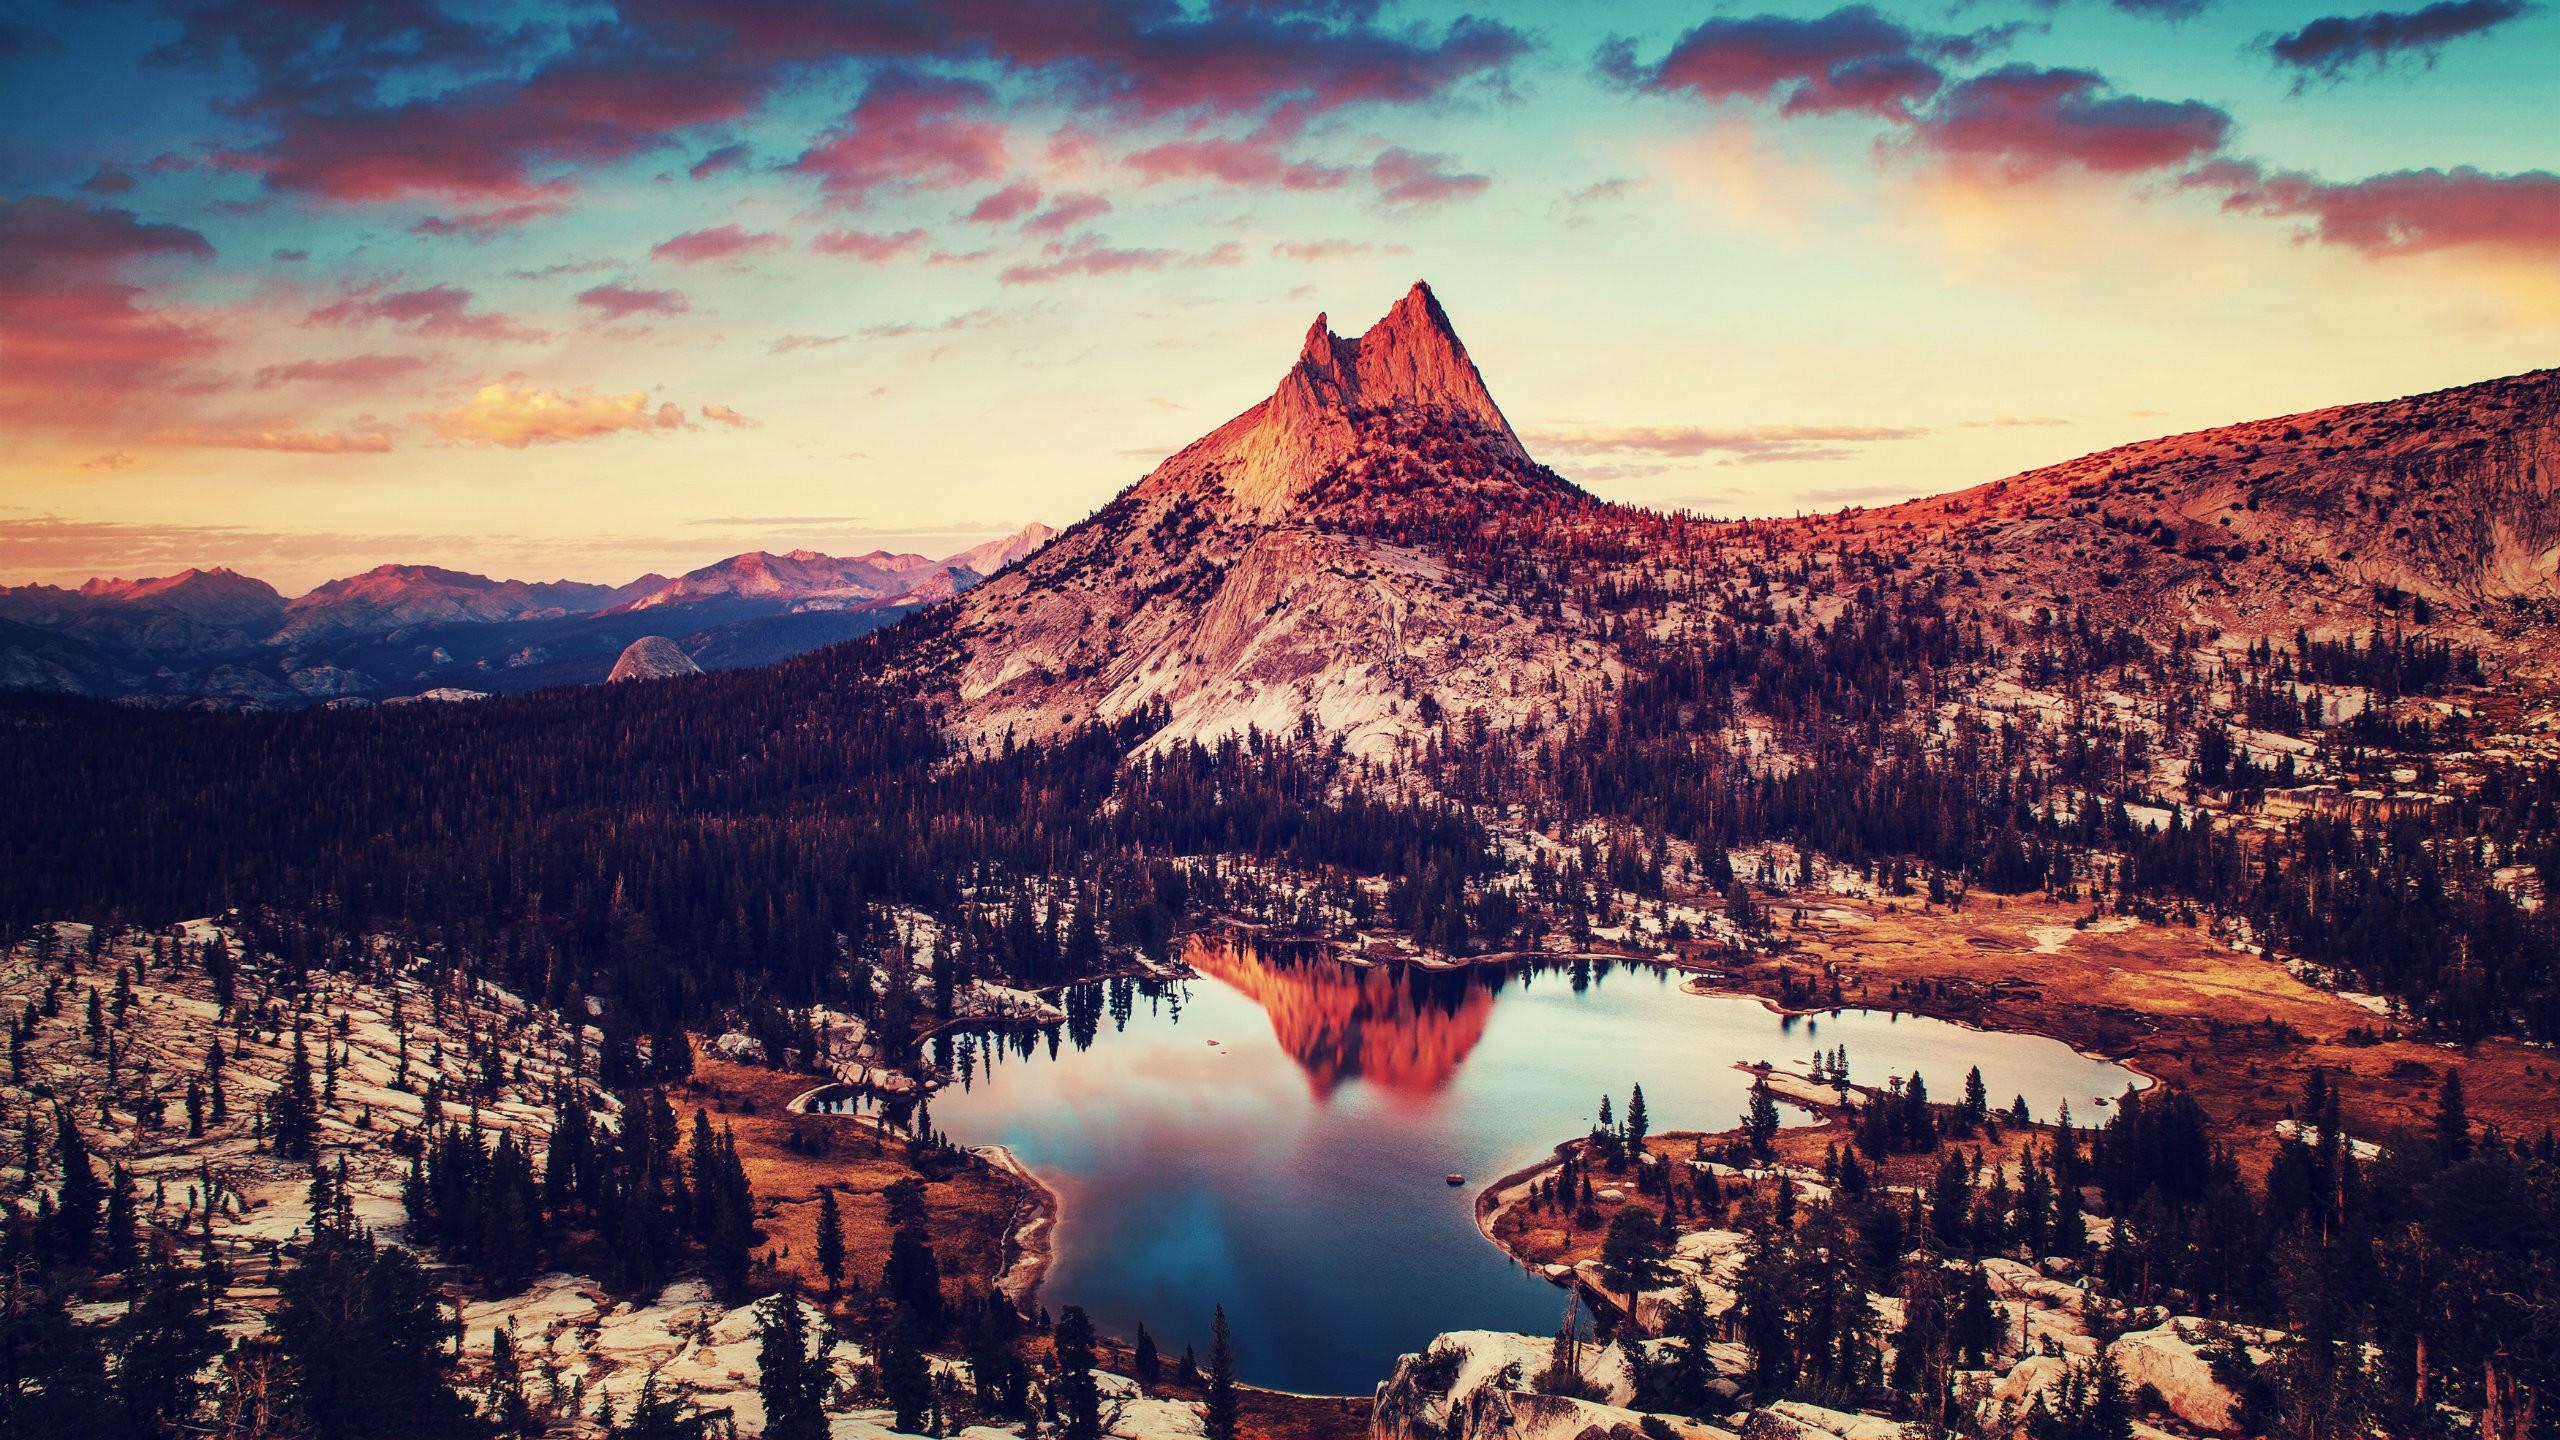 Yosemite National Park California Computer Wallpapers Desktop 2560x1440